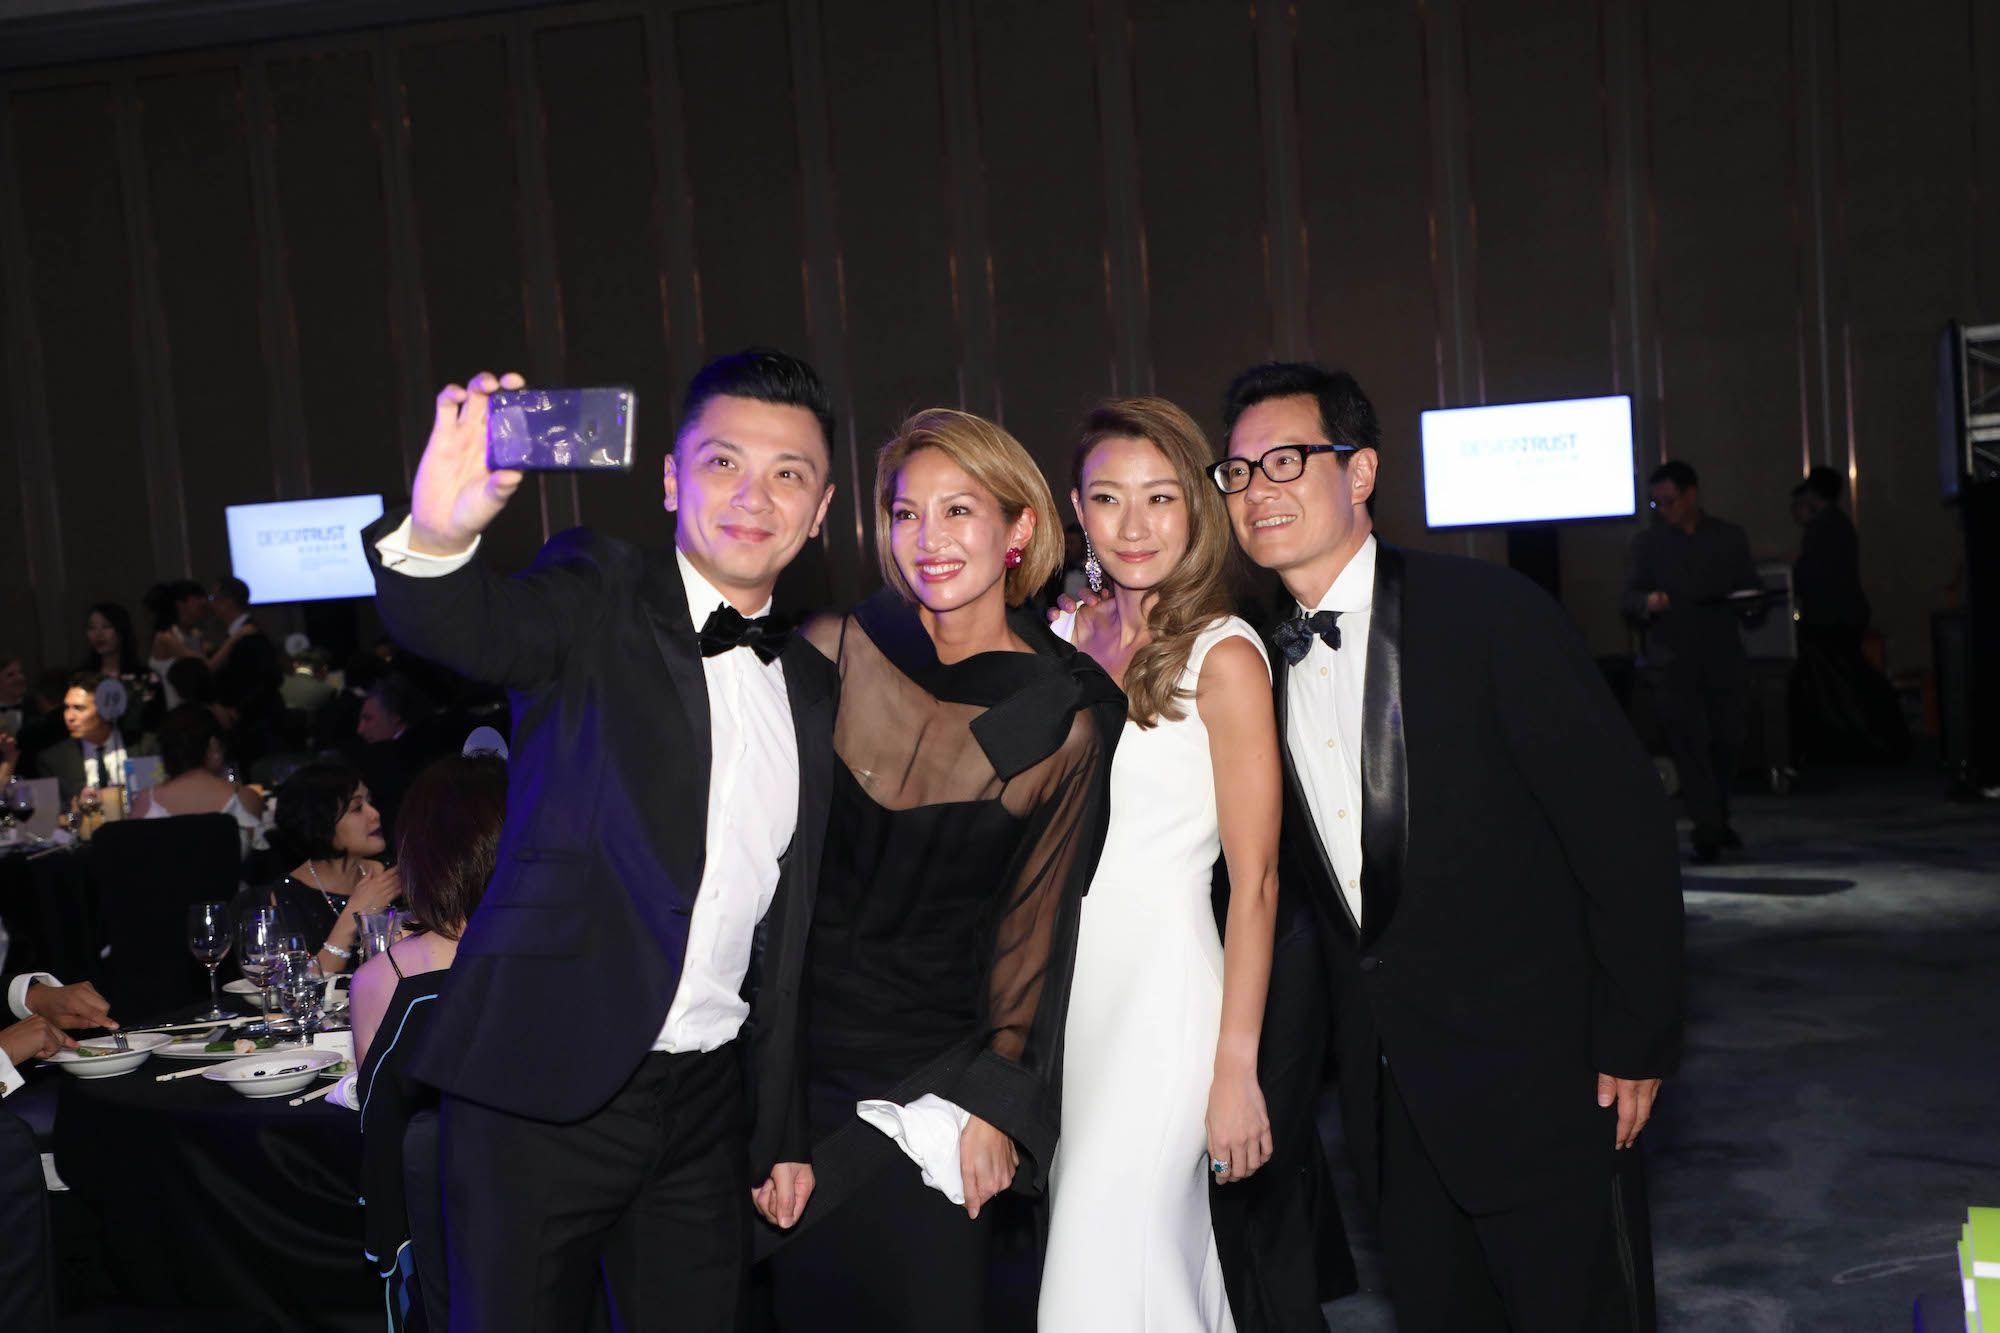 Sonia cheng paulo pong wedding dresses